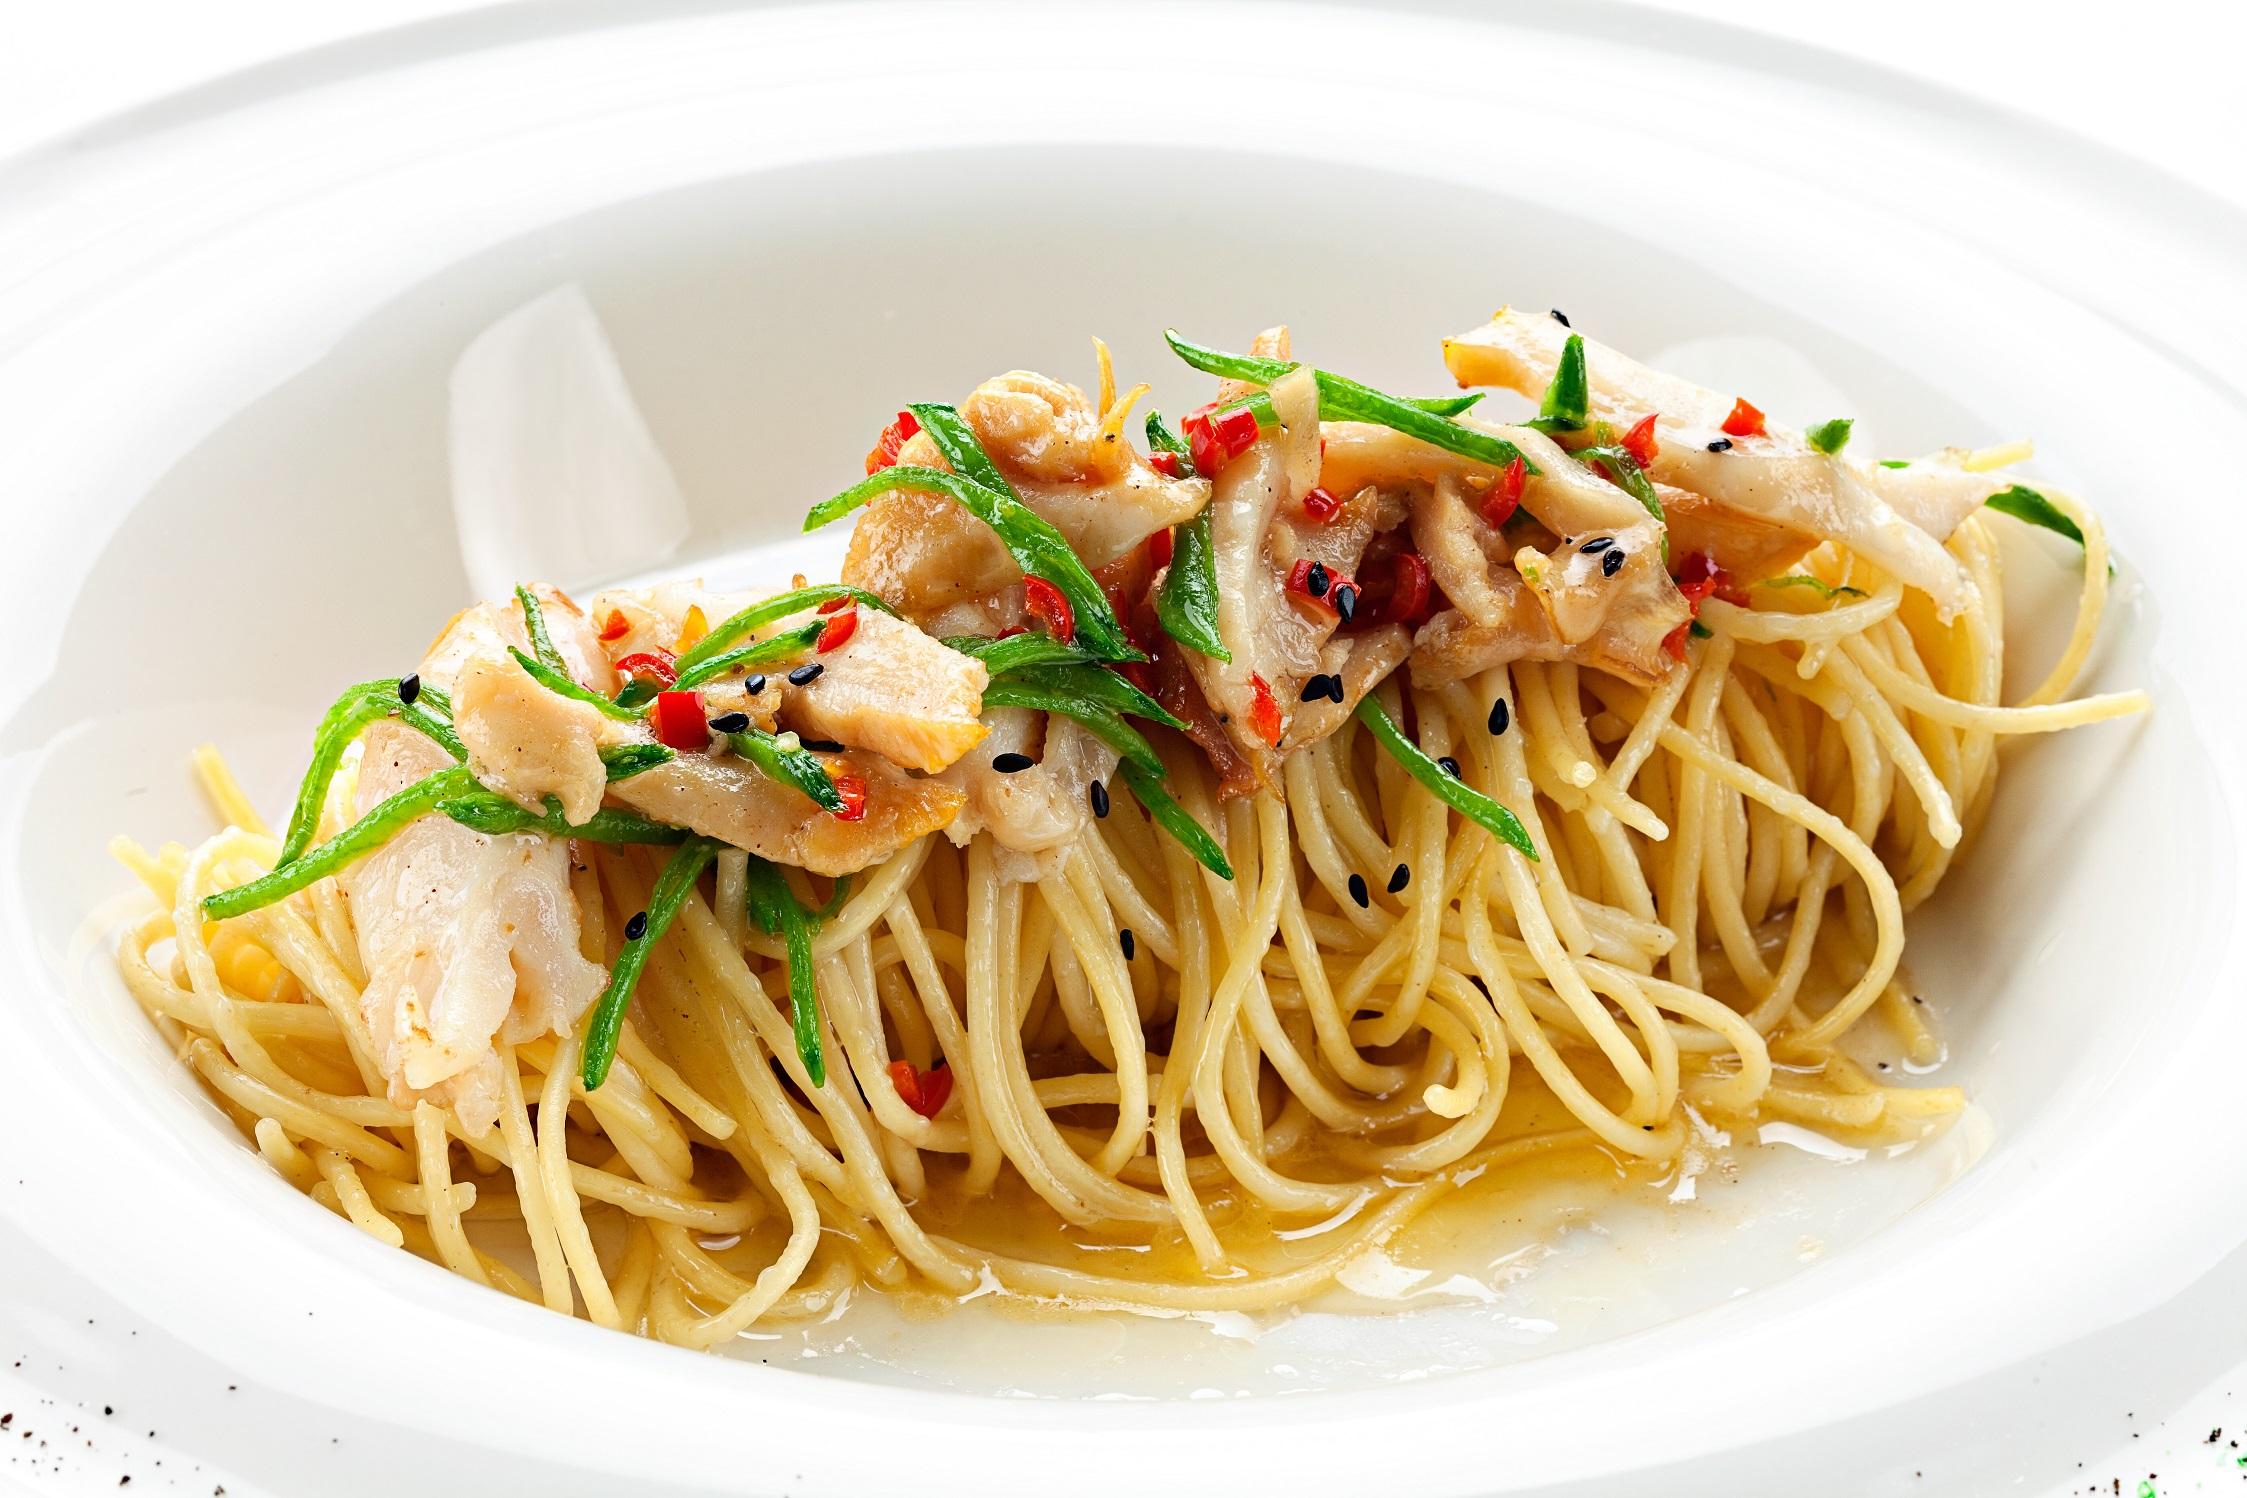 Ресторан Мумий Тролль Music Bar - Спагетти с трубачом в легком соусе